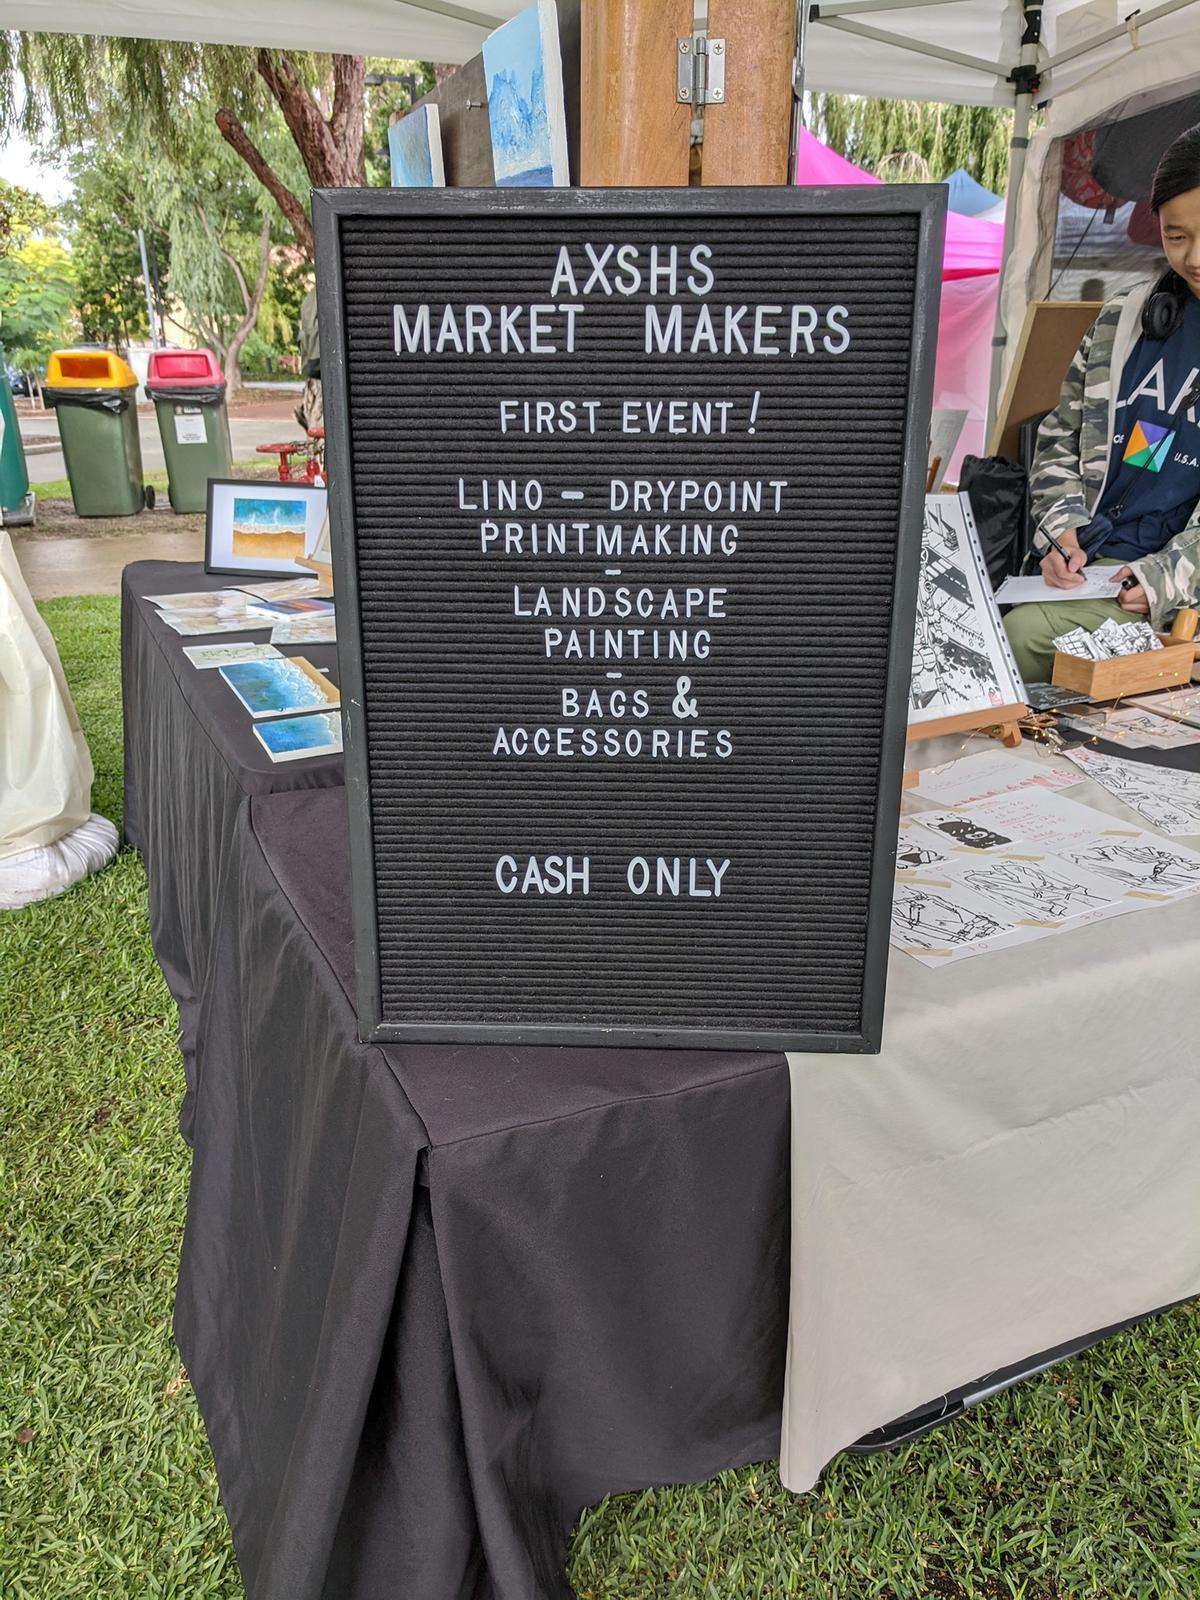 May Market - AXSHS Market Makers